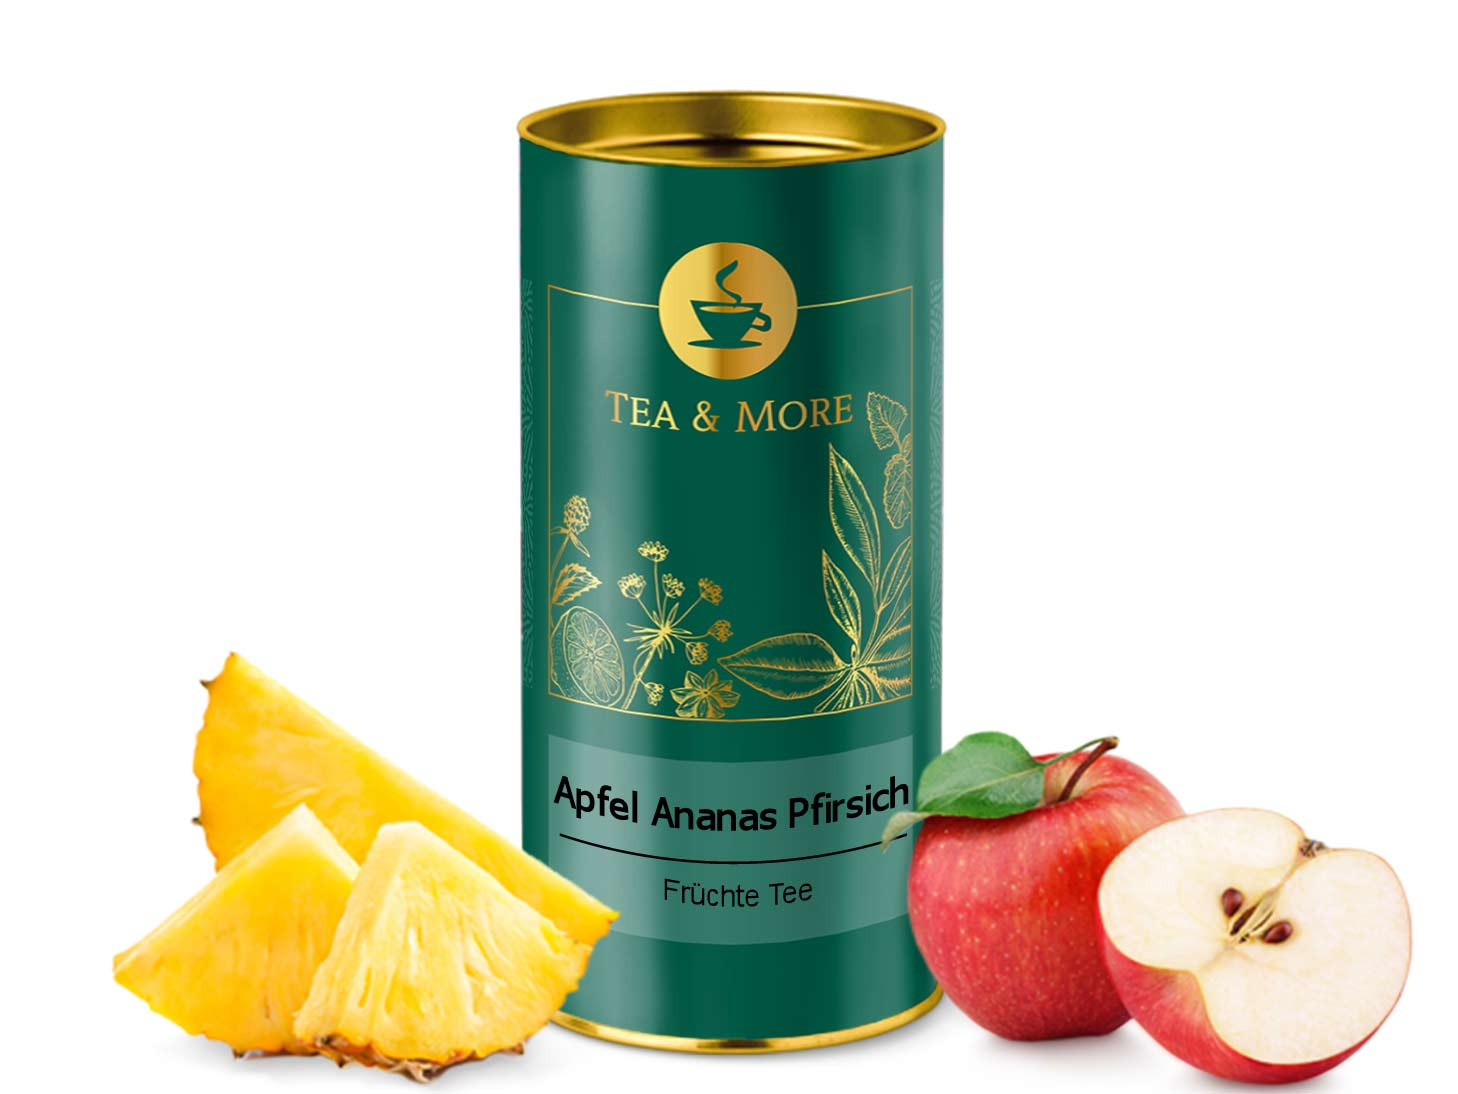 Apfel, Ananas & Pfirsich